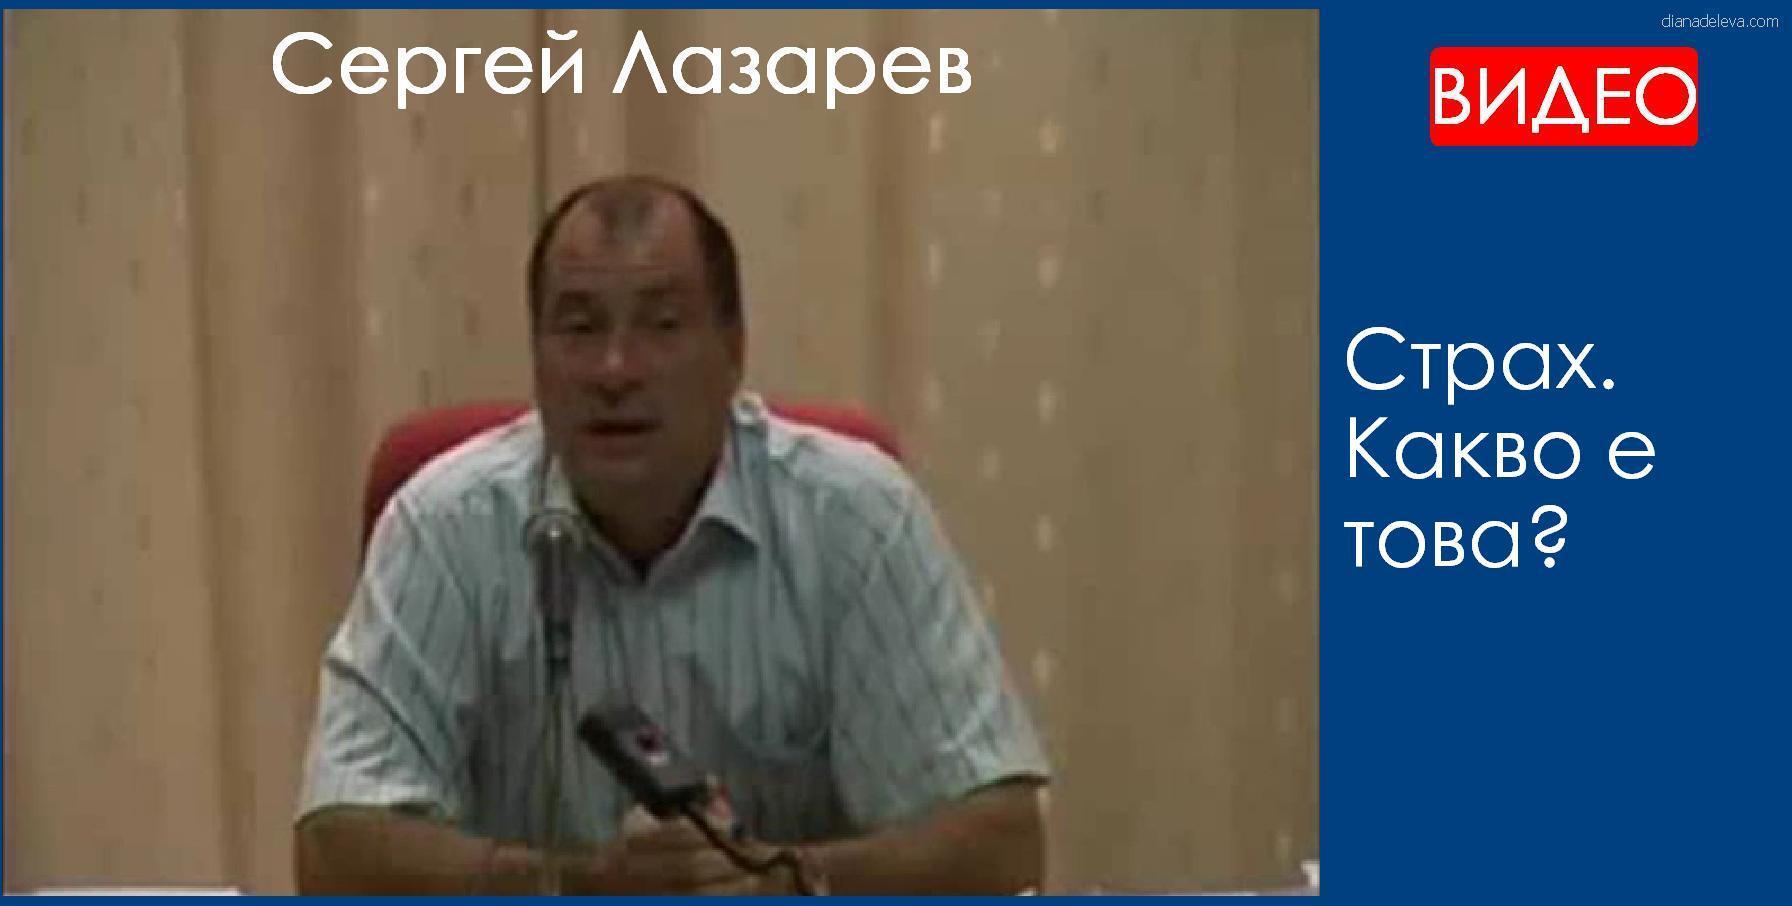 Сергей Лазарев какво е страх видео Sergei lazarev kakvo e strah video